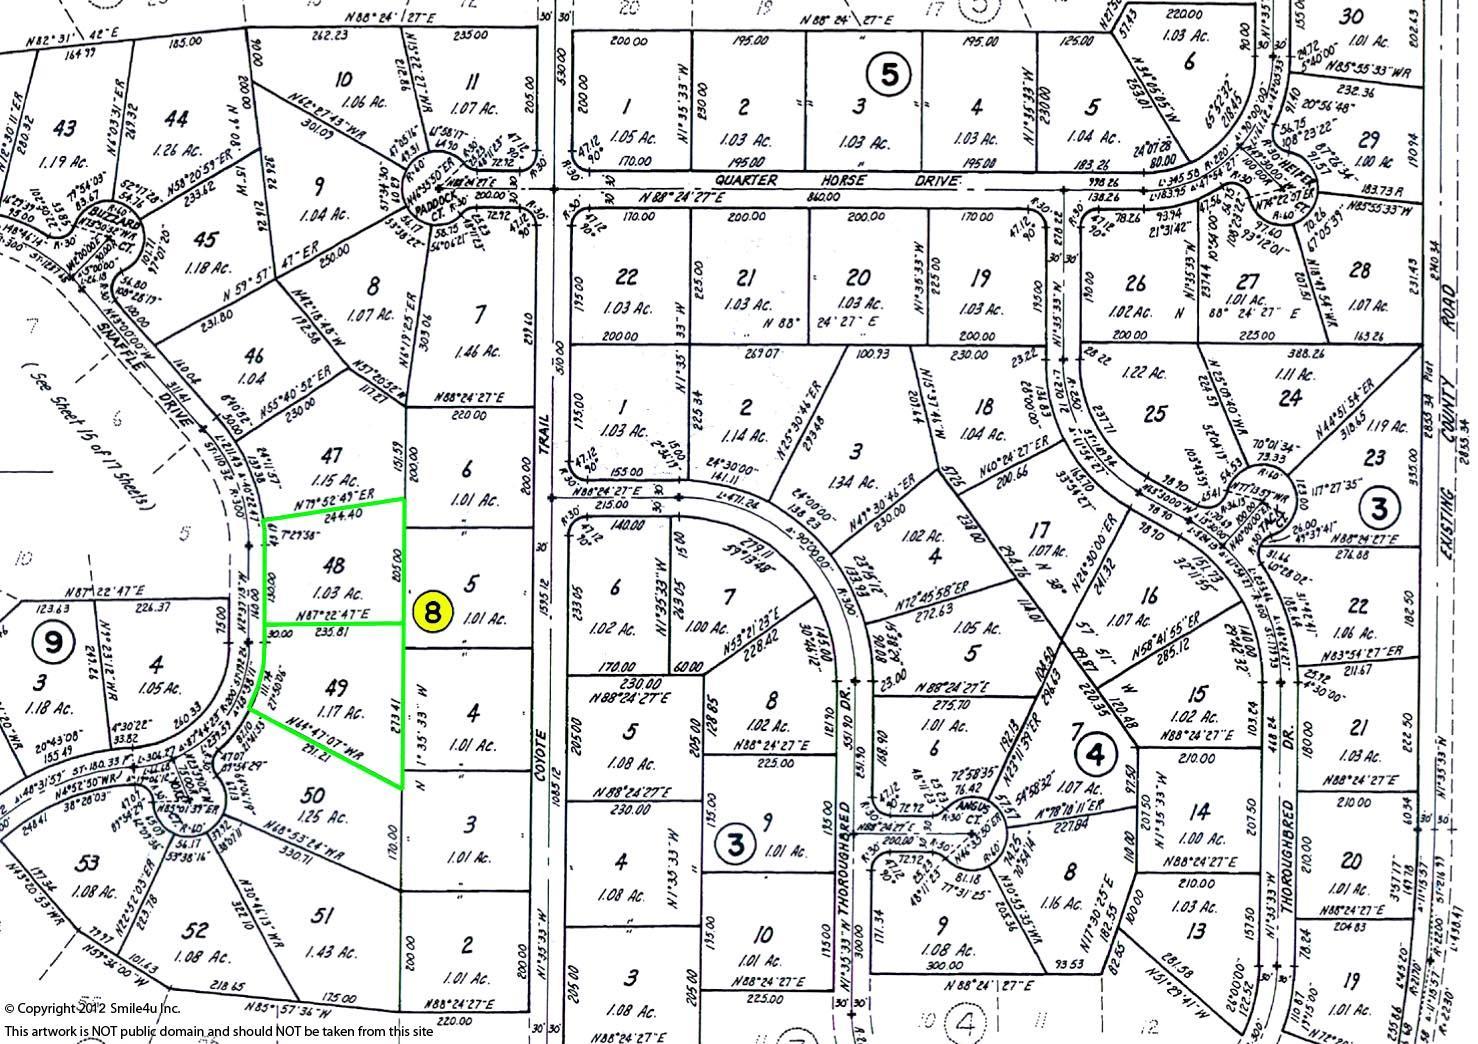 Washington Recreational Land 1 Acre